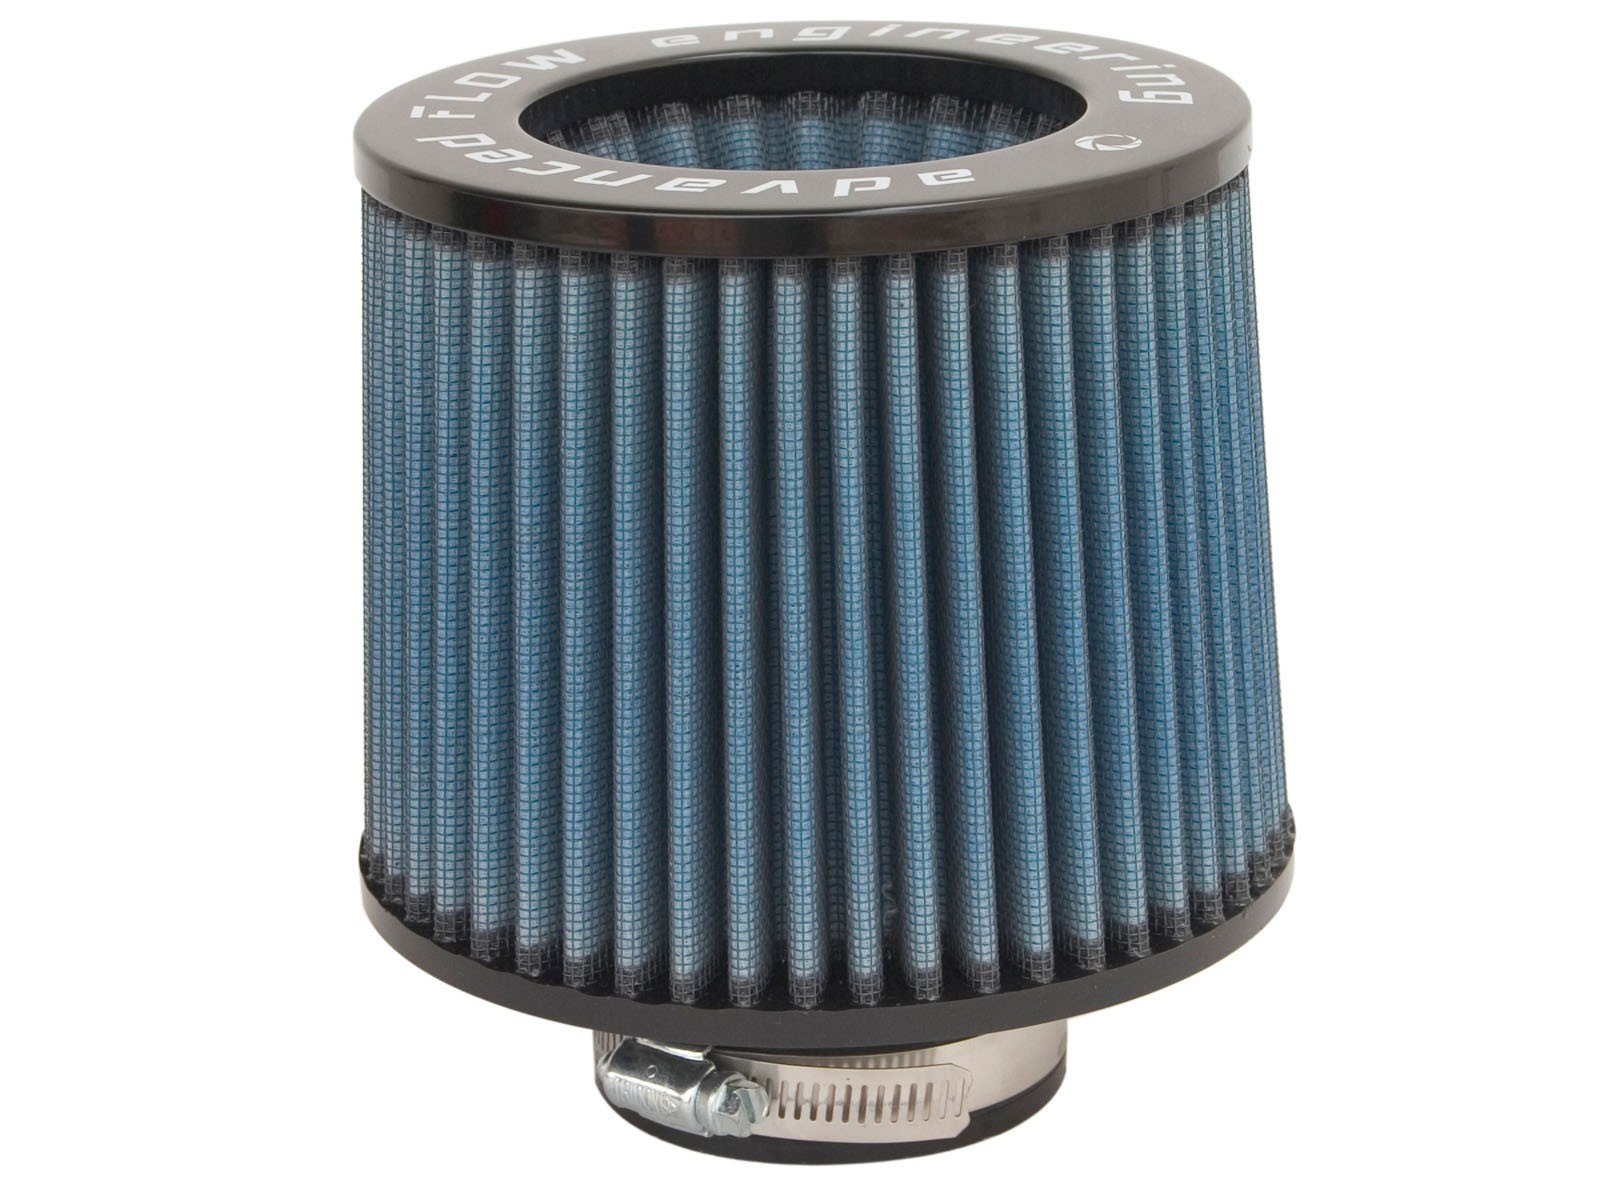 aFe POWER 24-91013 Magnum FLOW Pro 5R Air Filter